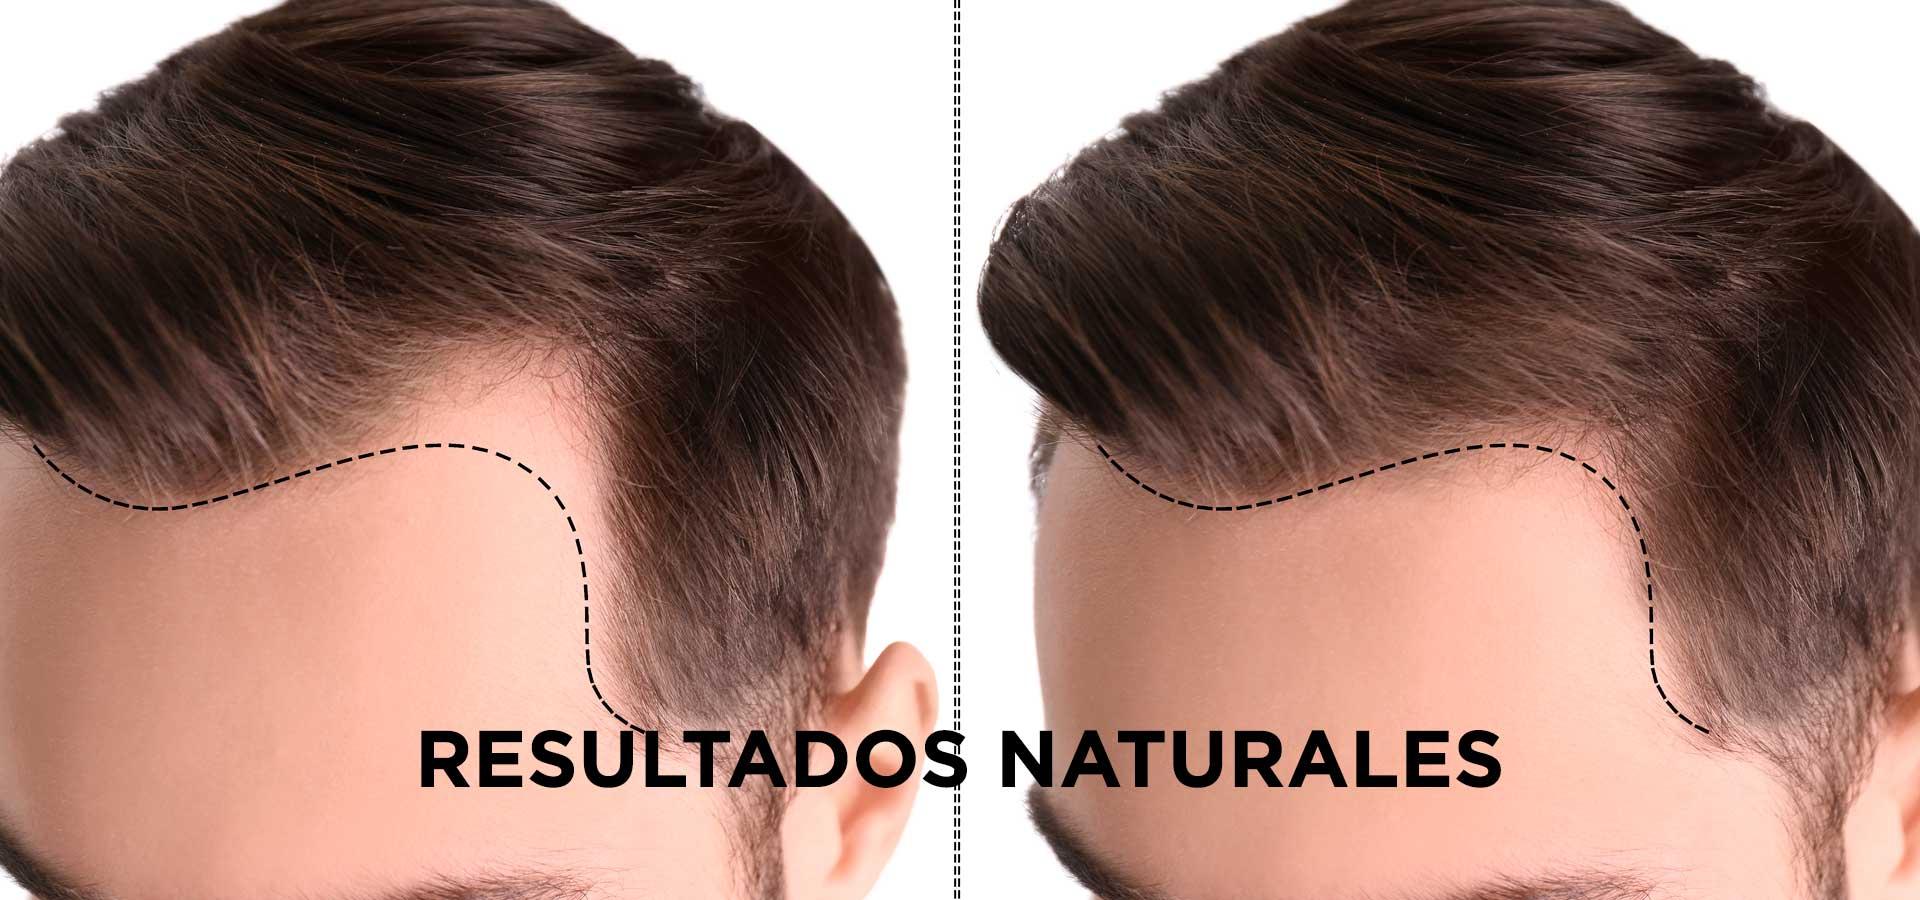 Implante Capilar Antes Después Élite Medical Madrid